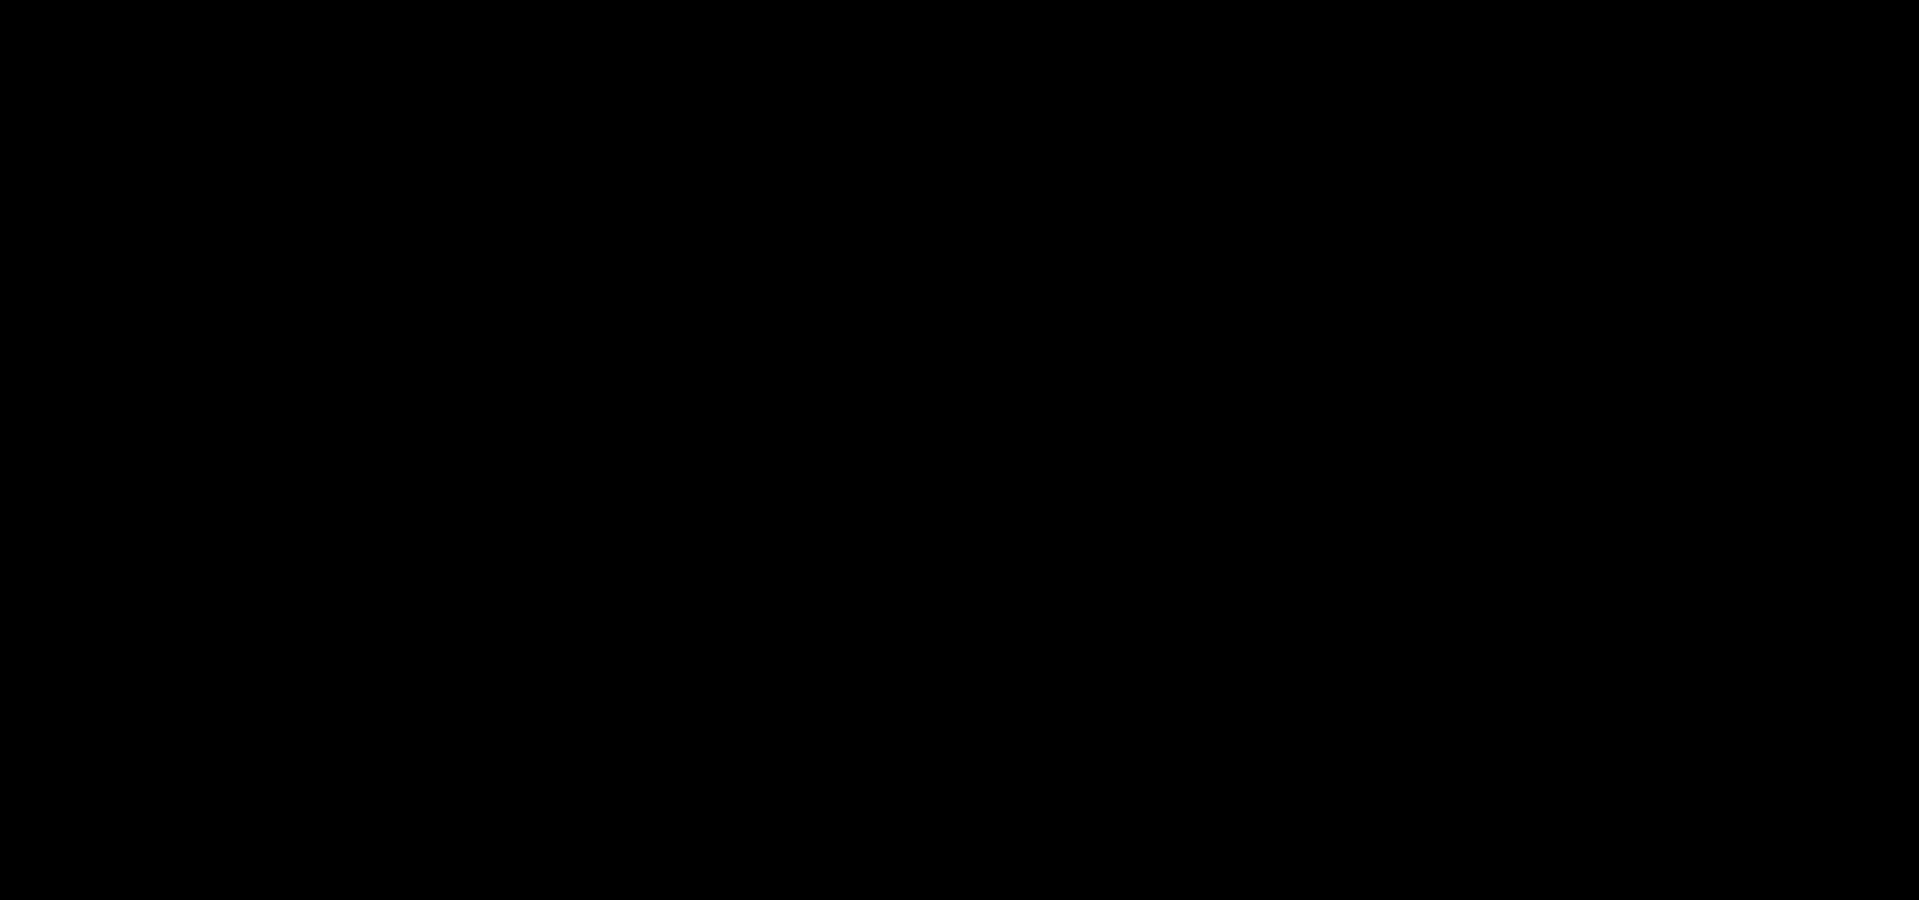 Energica SuperSonicos